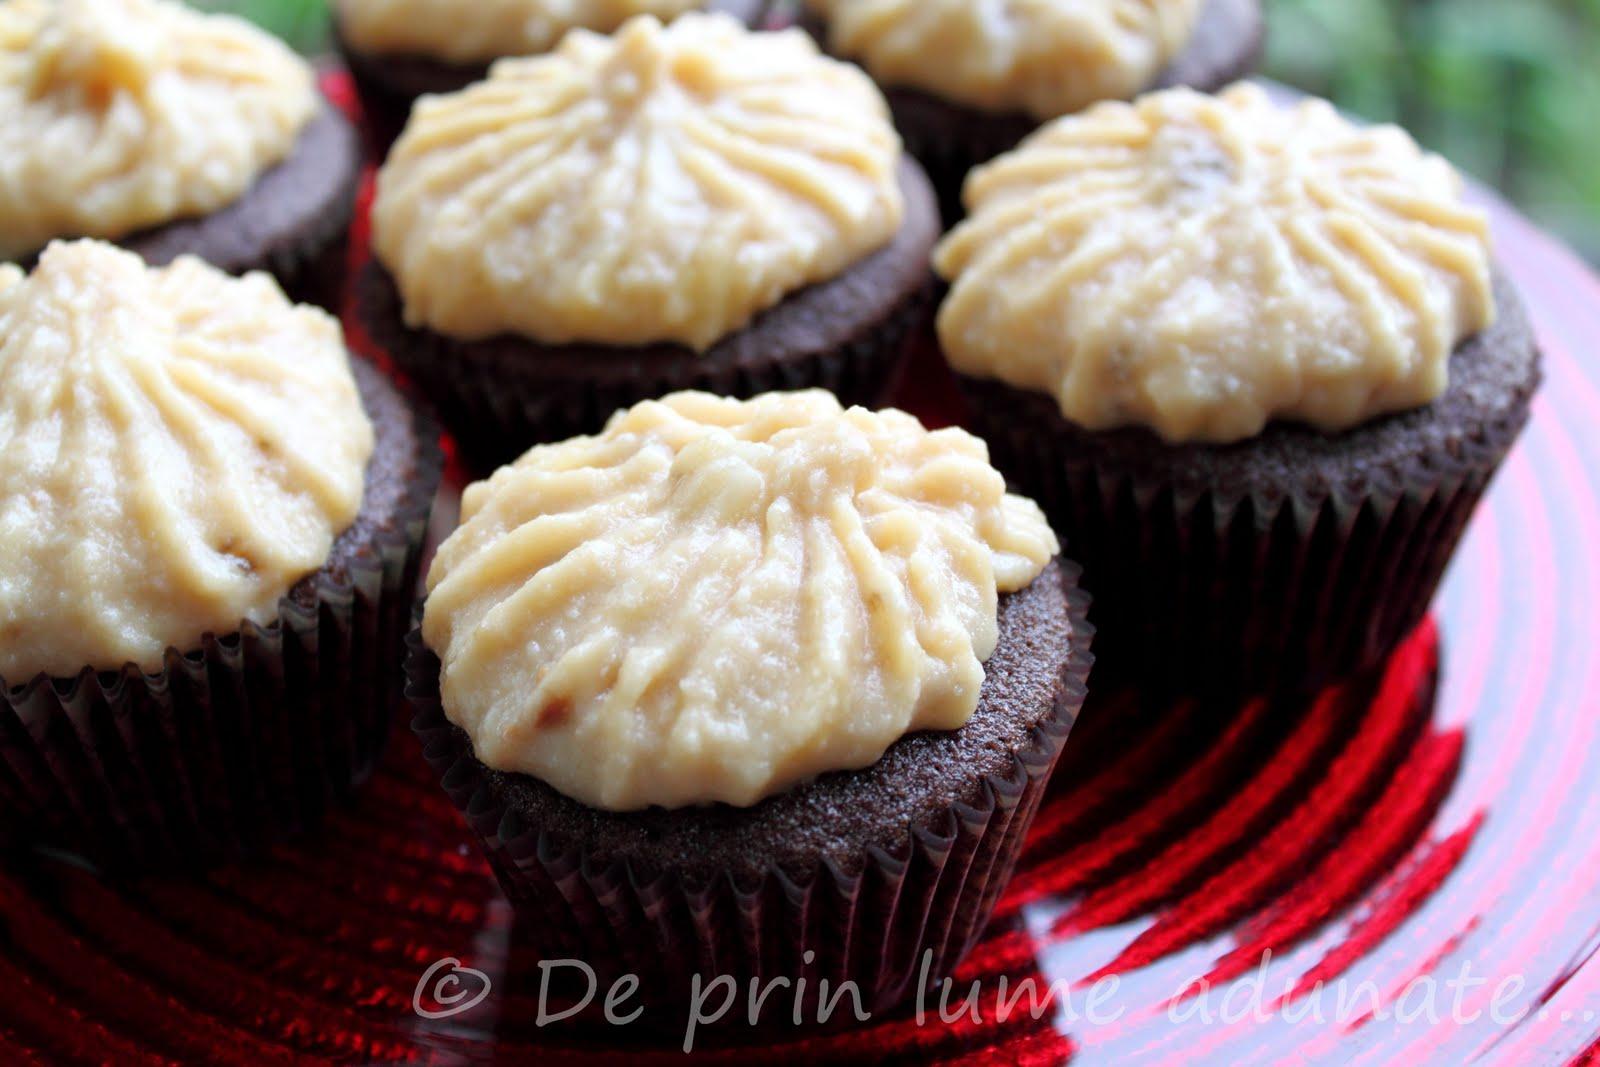 ... de banana si dulce de leche/ Chocolate cupcakes with banana and dulce